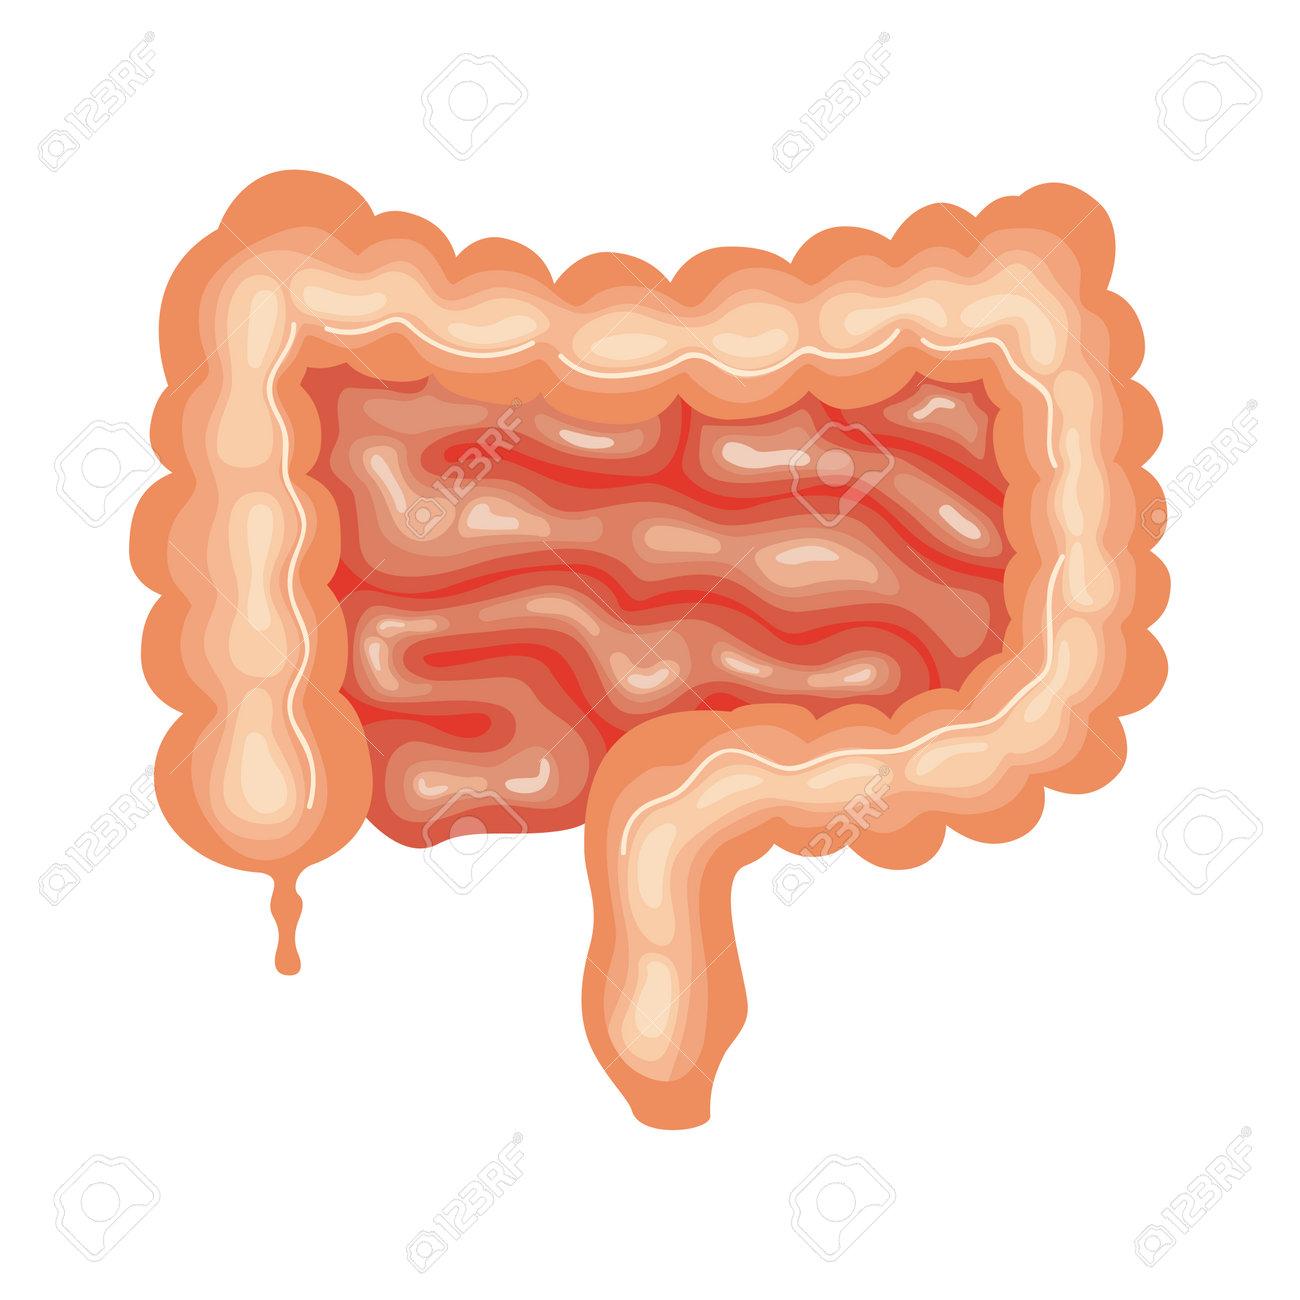 intestine organ human anatomy icon - 167623248